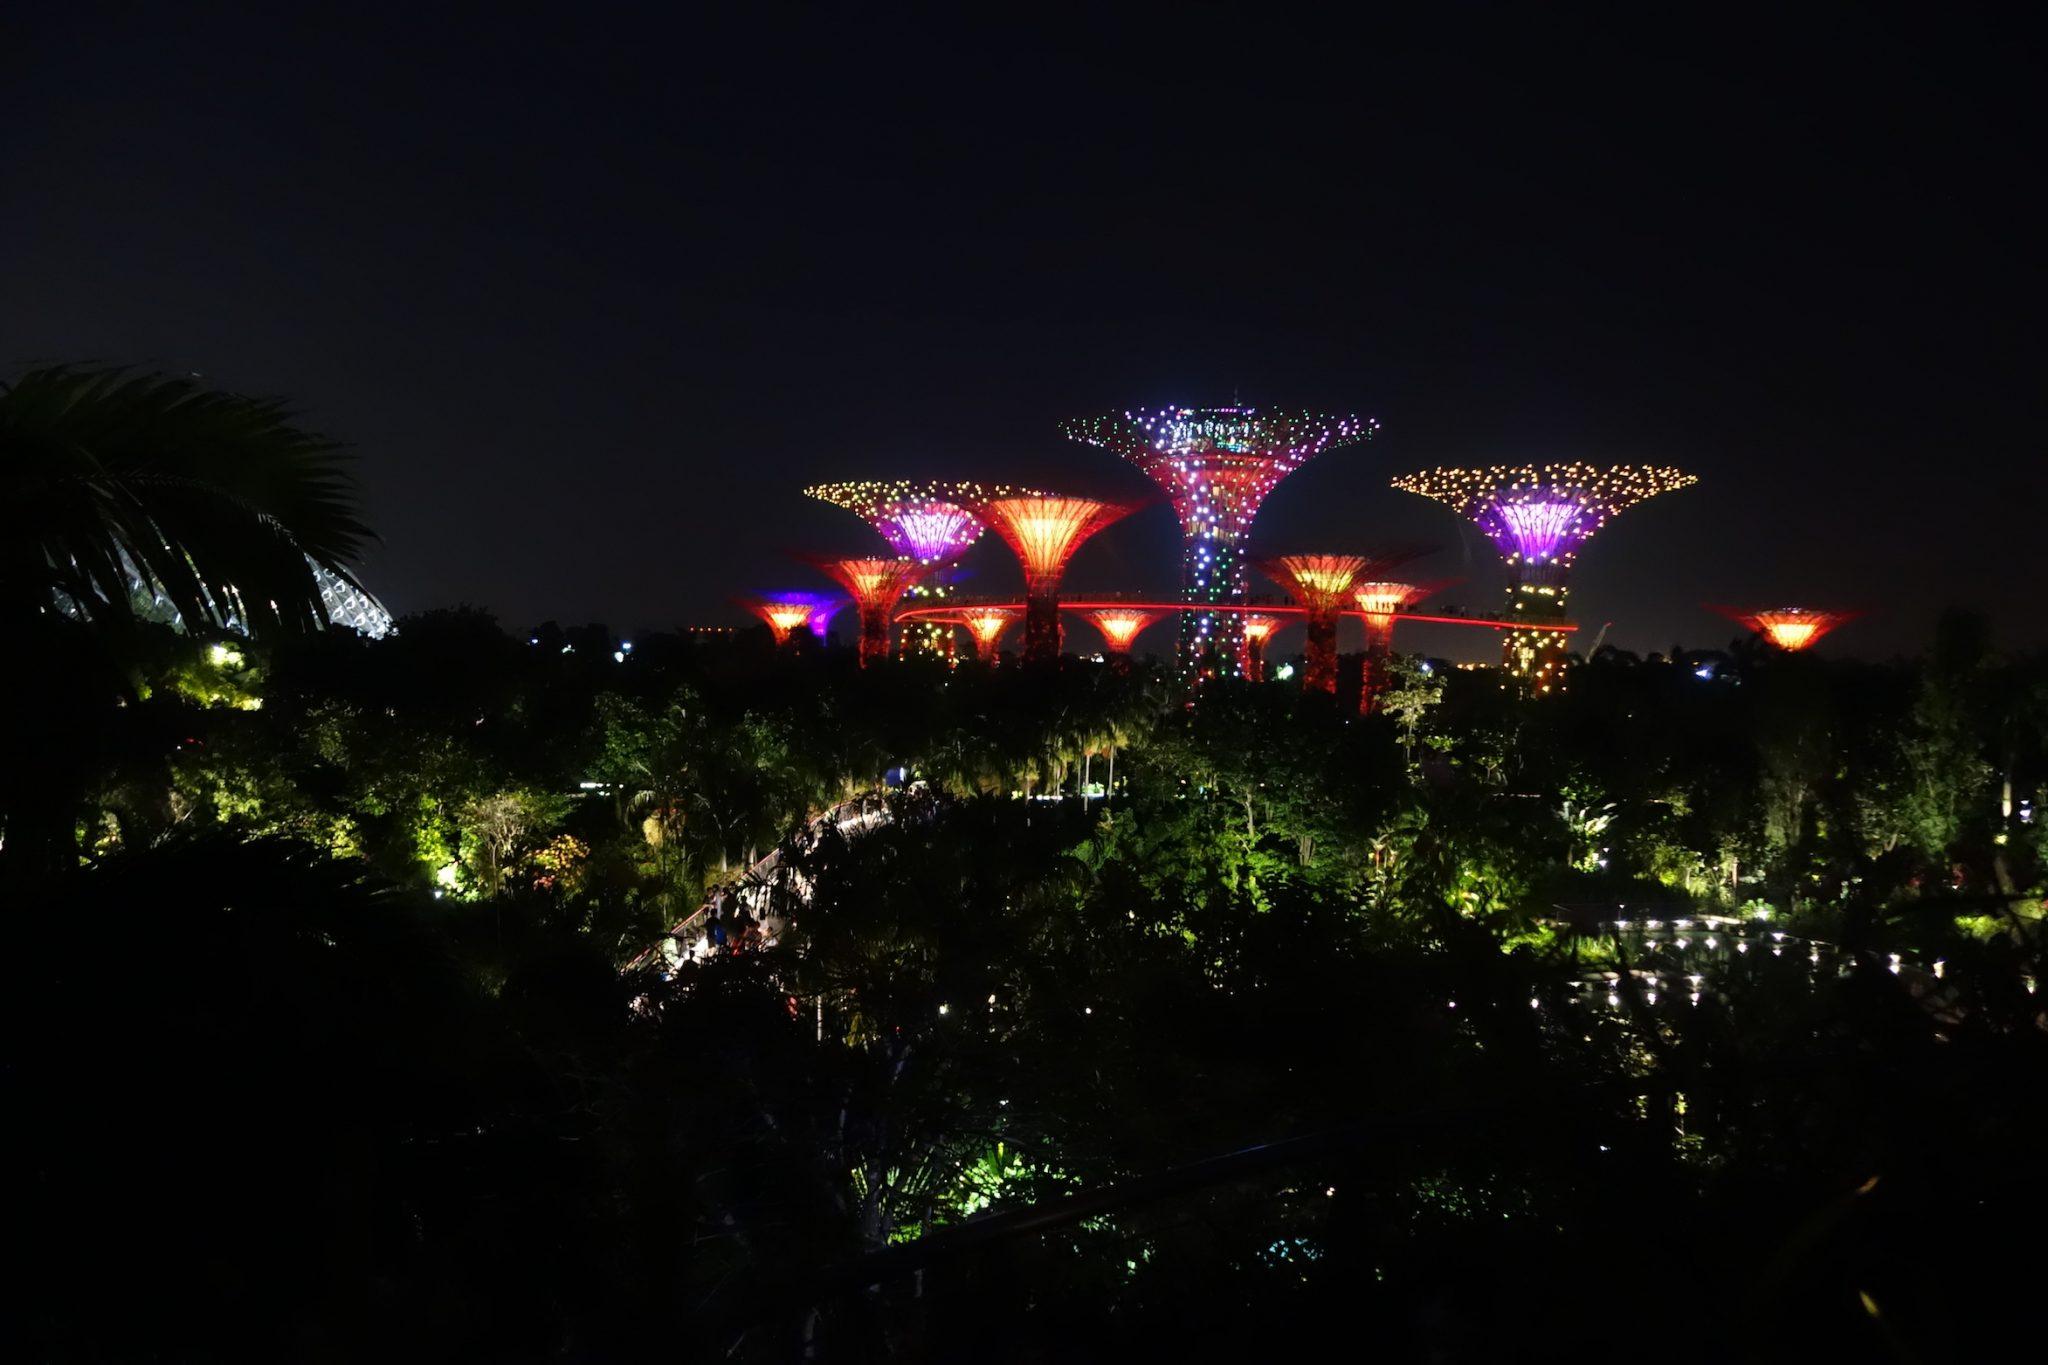 Singapur_GardensbytheBay_SkyTrees_beiNacht_1